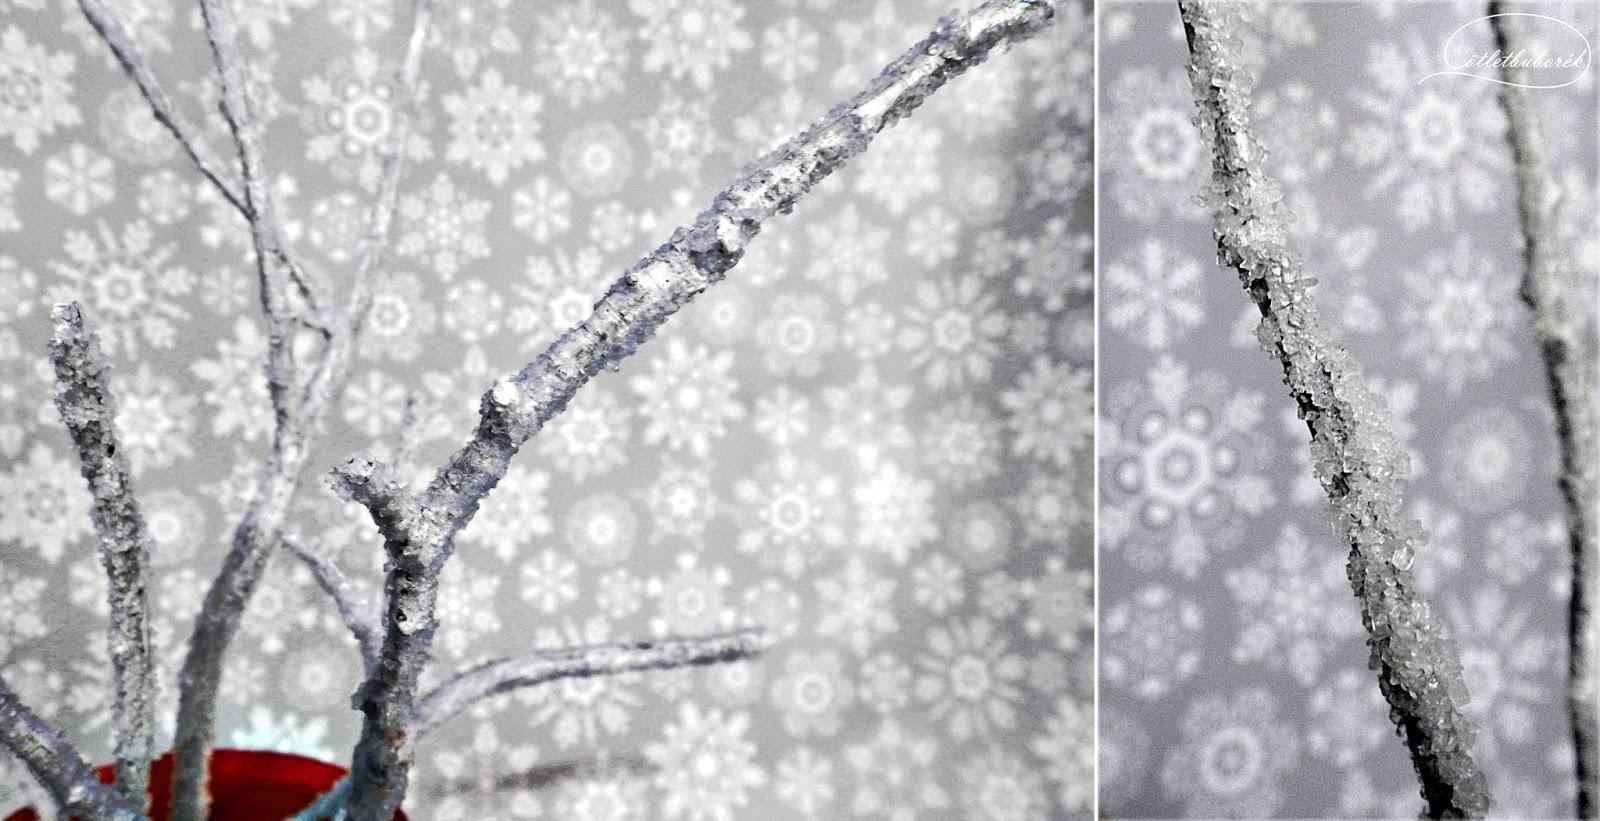 Téli dekorág kristálycukorral